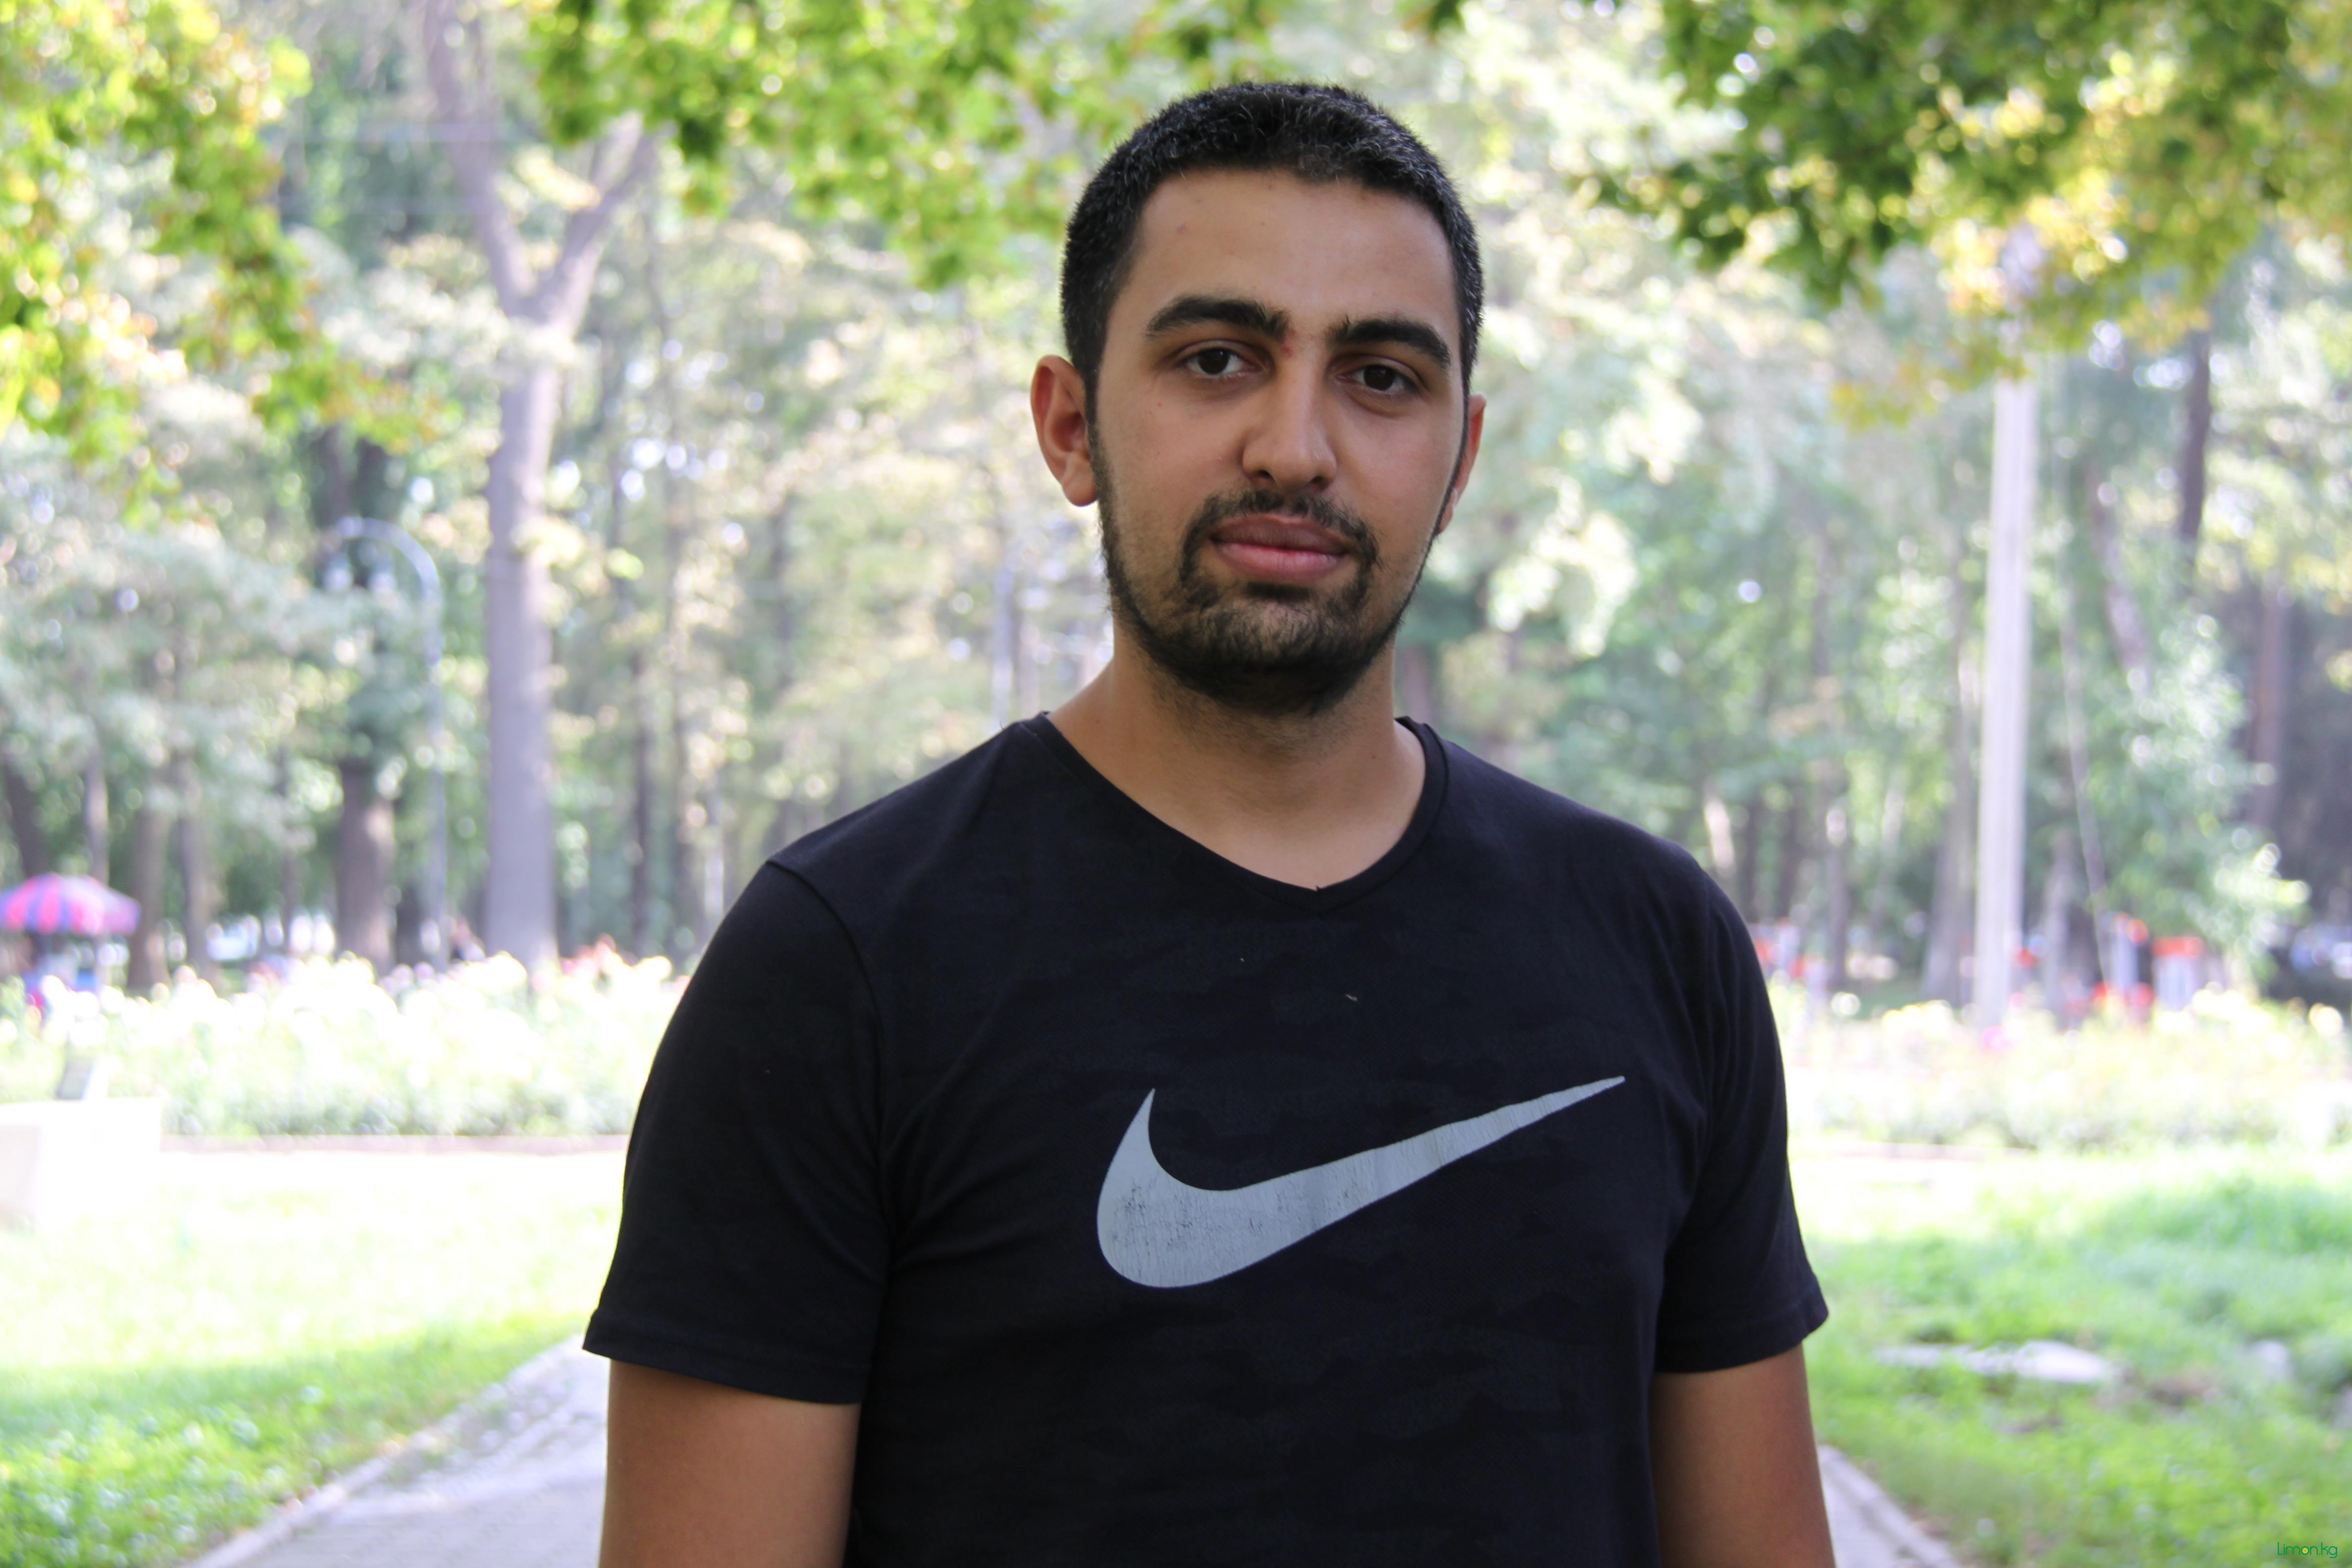 Исмаилов Рауф, 24 года, чп